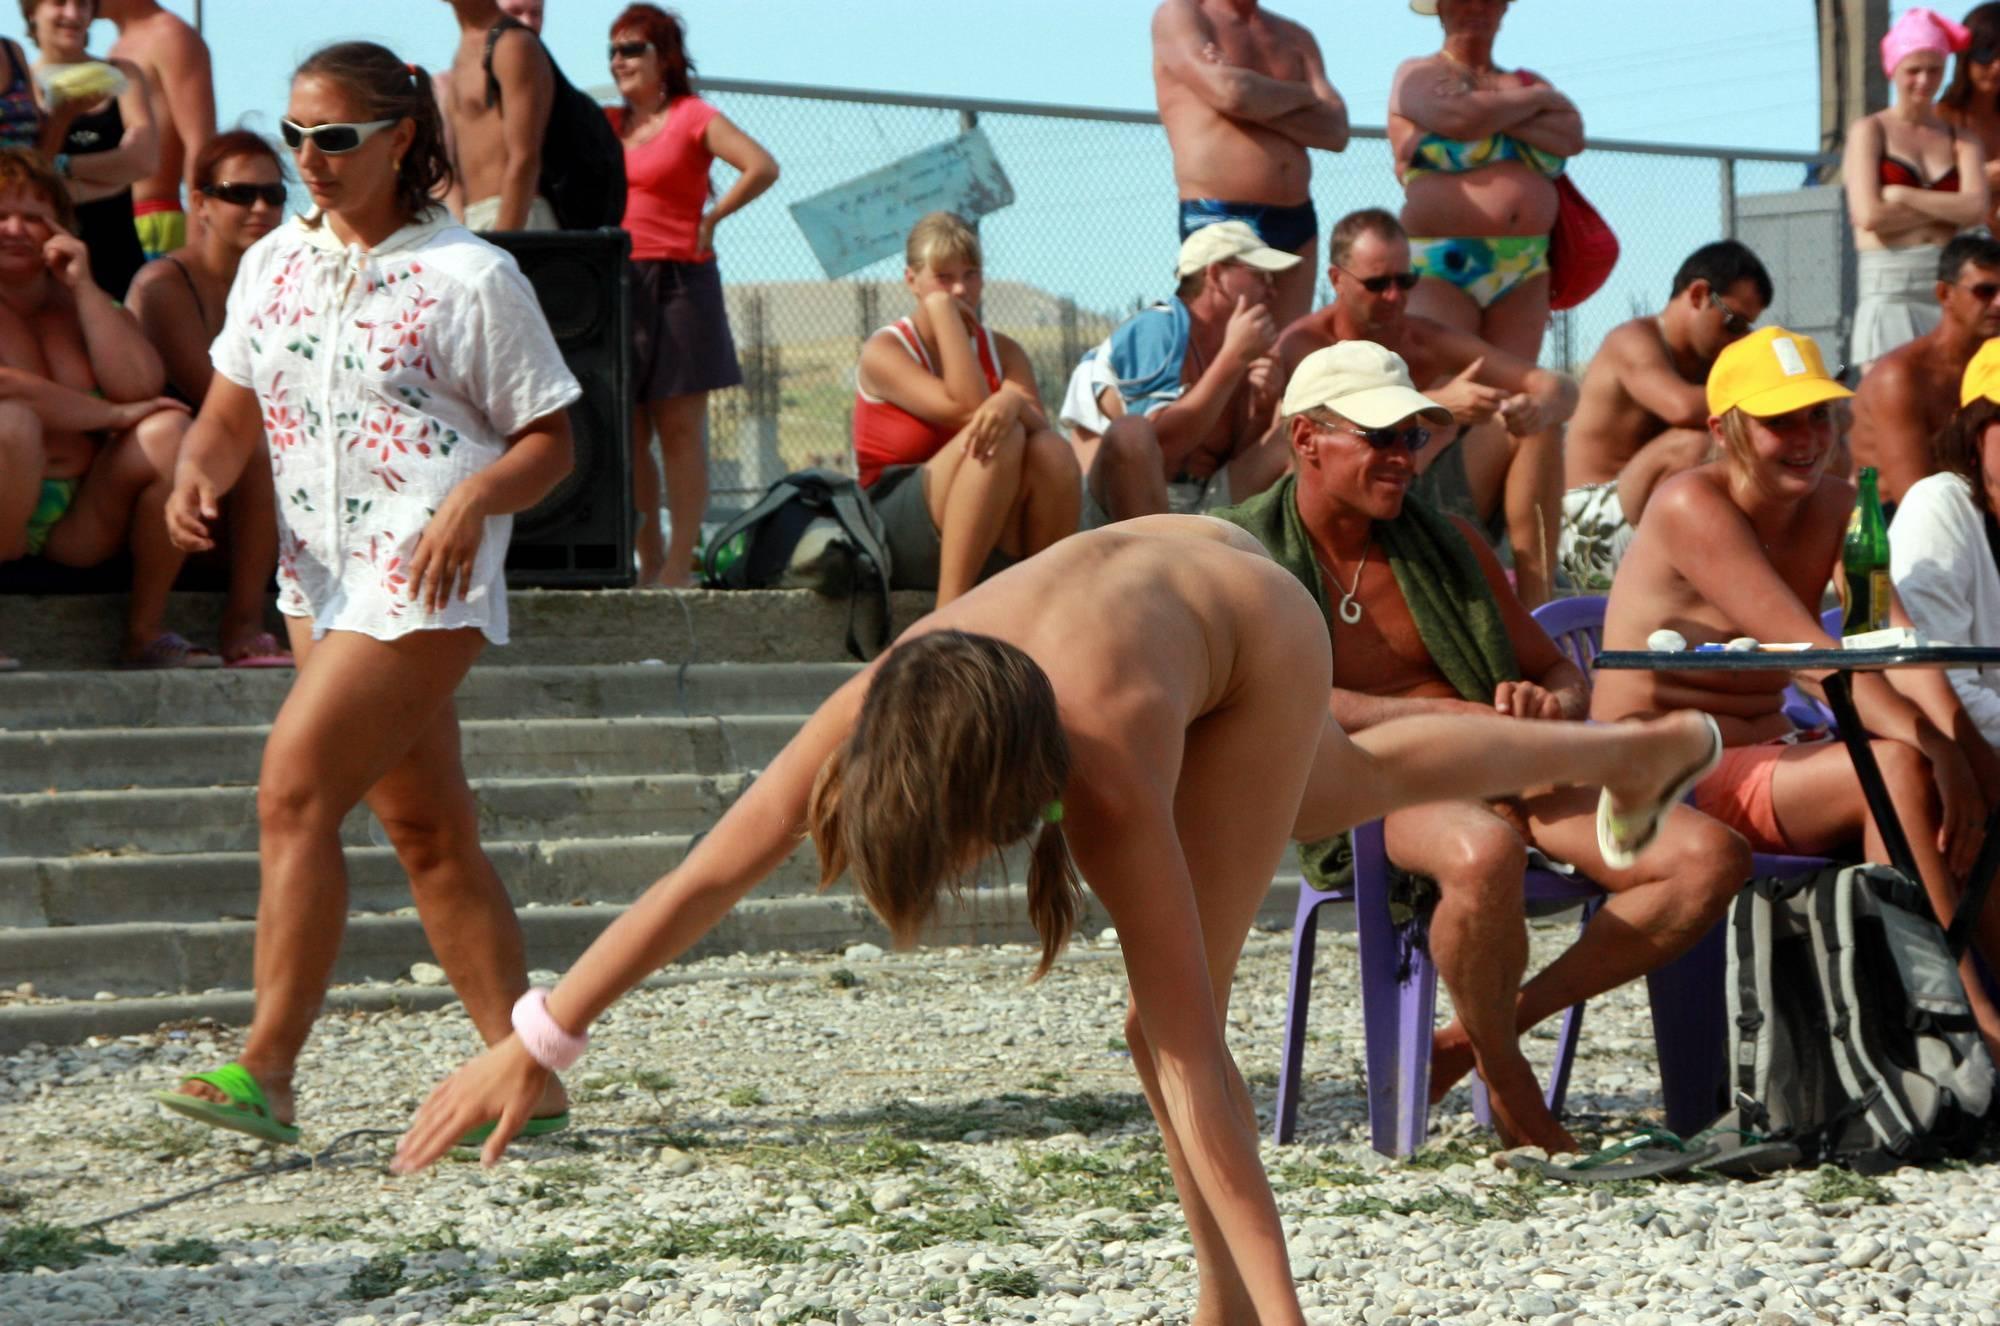 Cartwheel and Beach Dance - 1